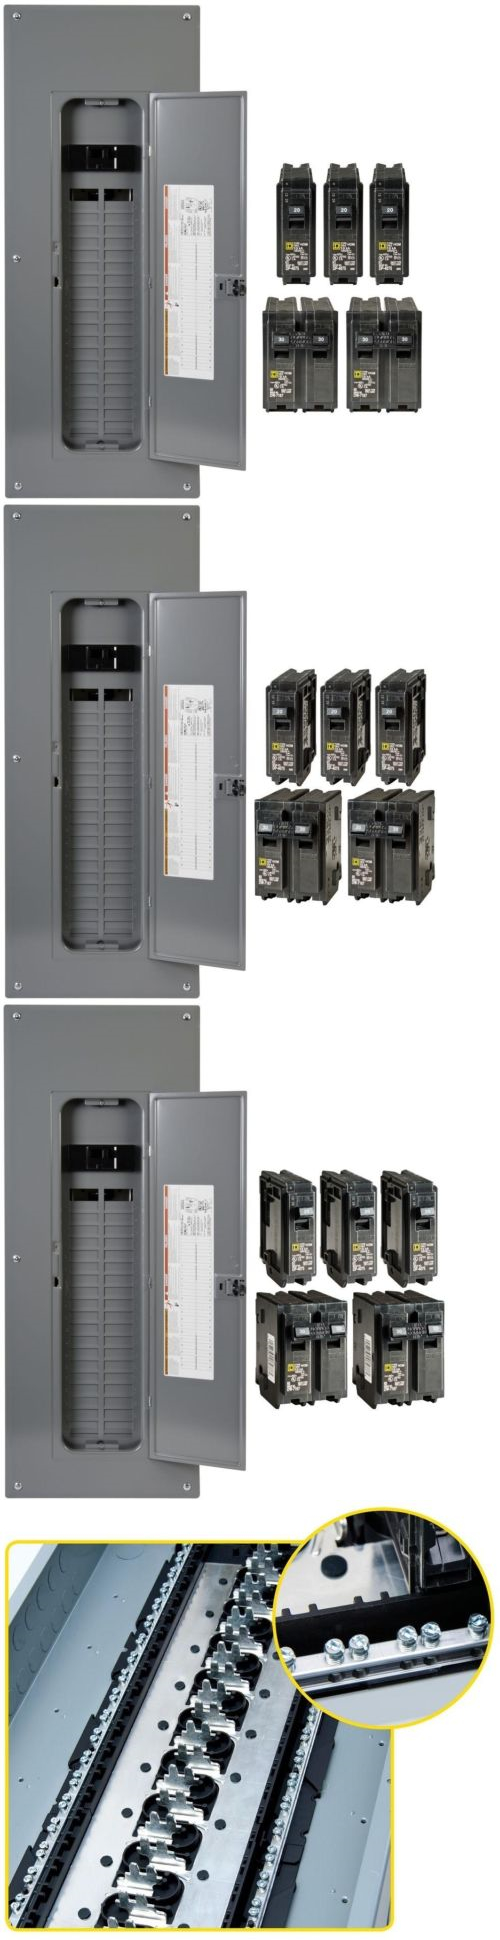 Circuit Breakers and Fuse Boxes 20596: 200 Amp 40 Space 80 Circuit Indoor Main  Breaker